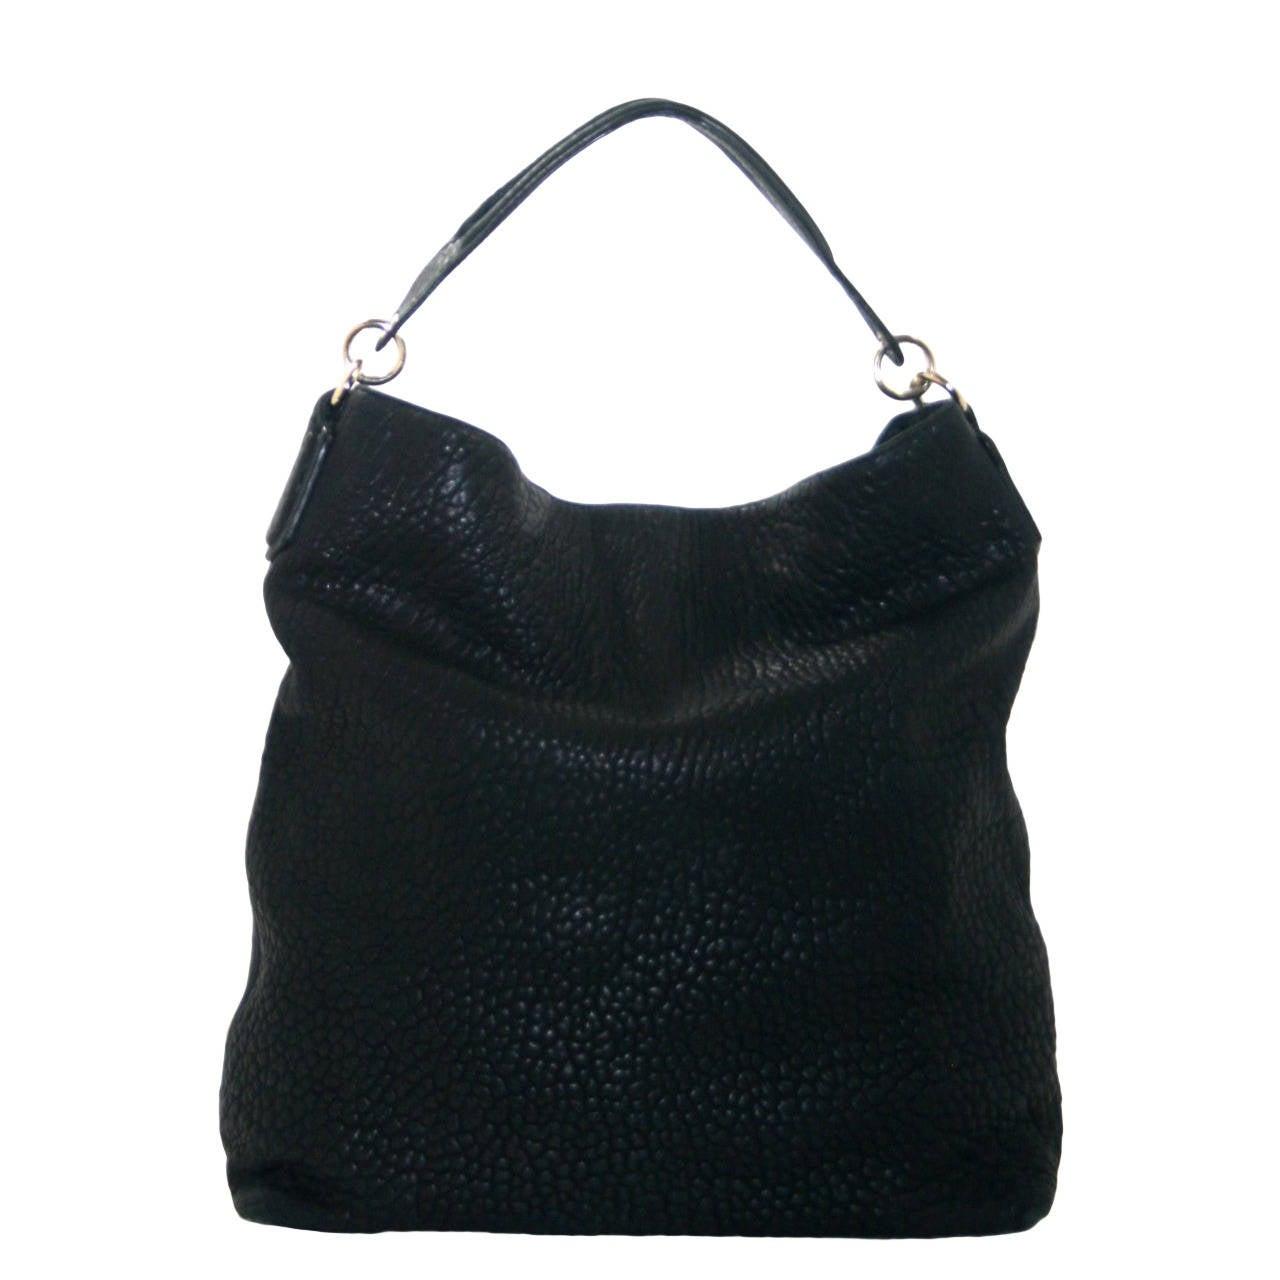 Alexander Wang Darcy Stud Bottom Hobo in Black Pebbled Leather 1